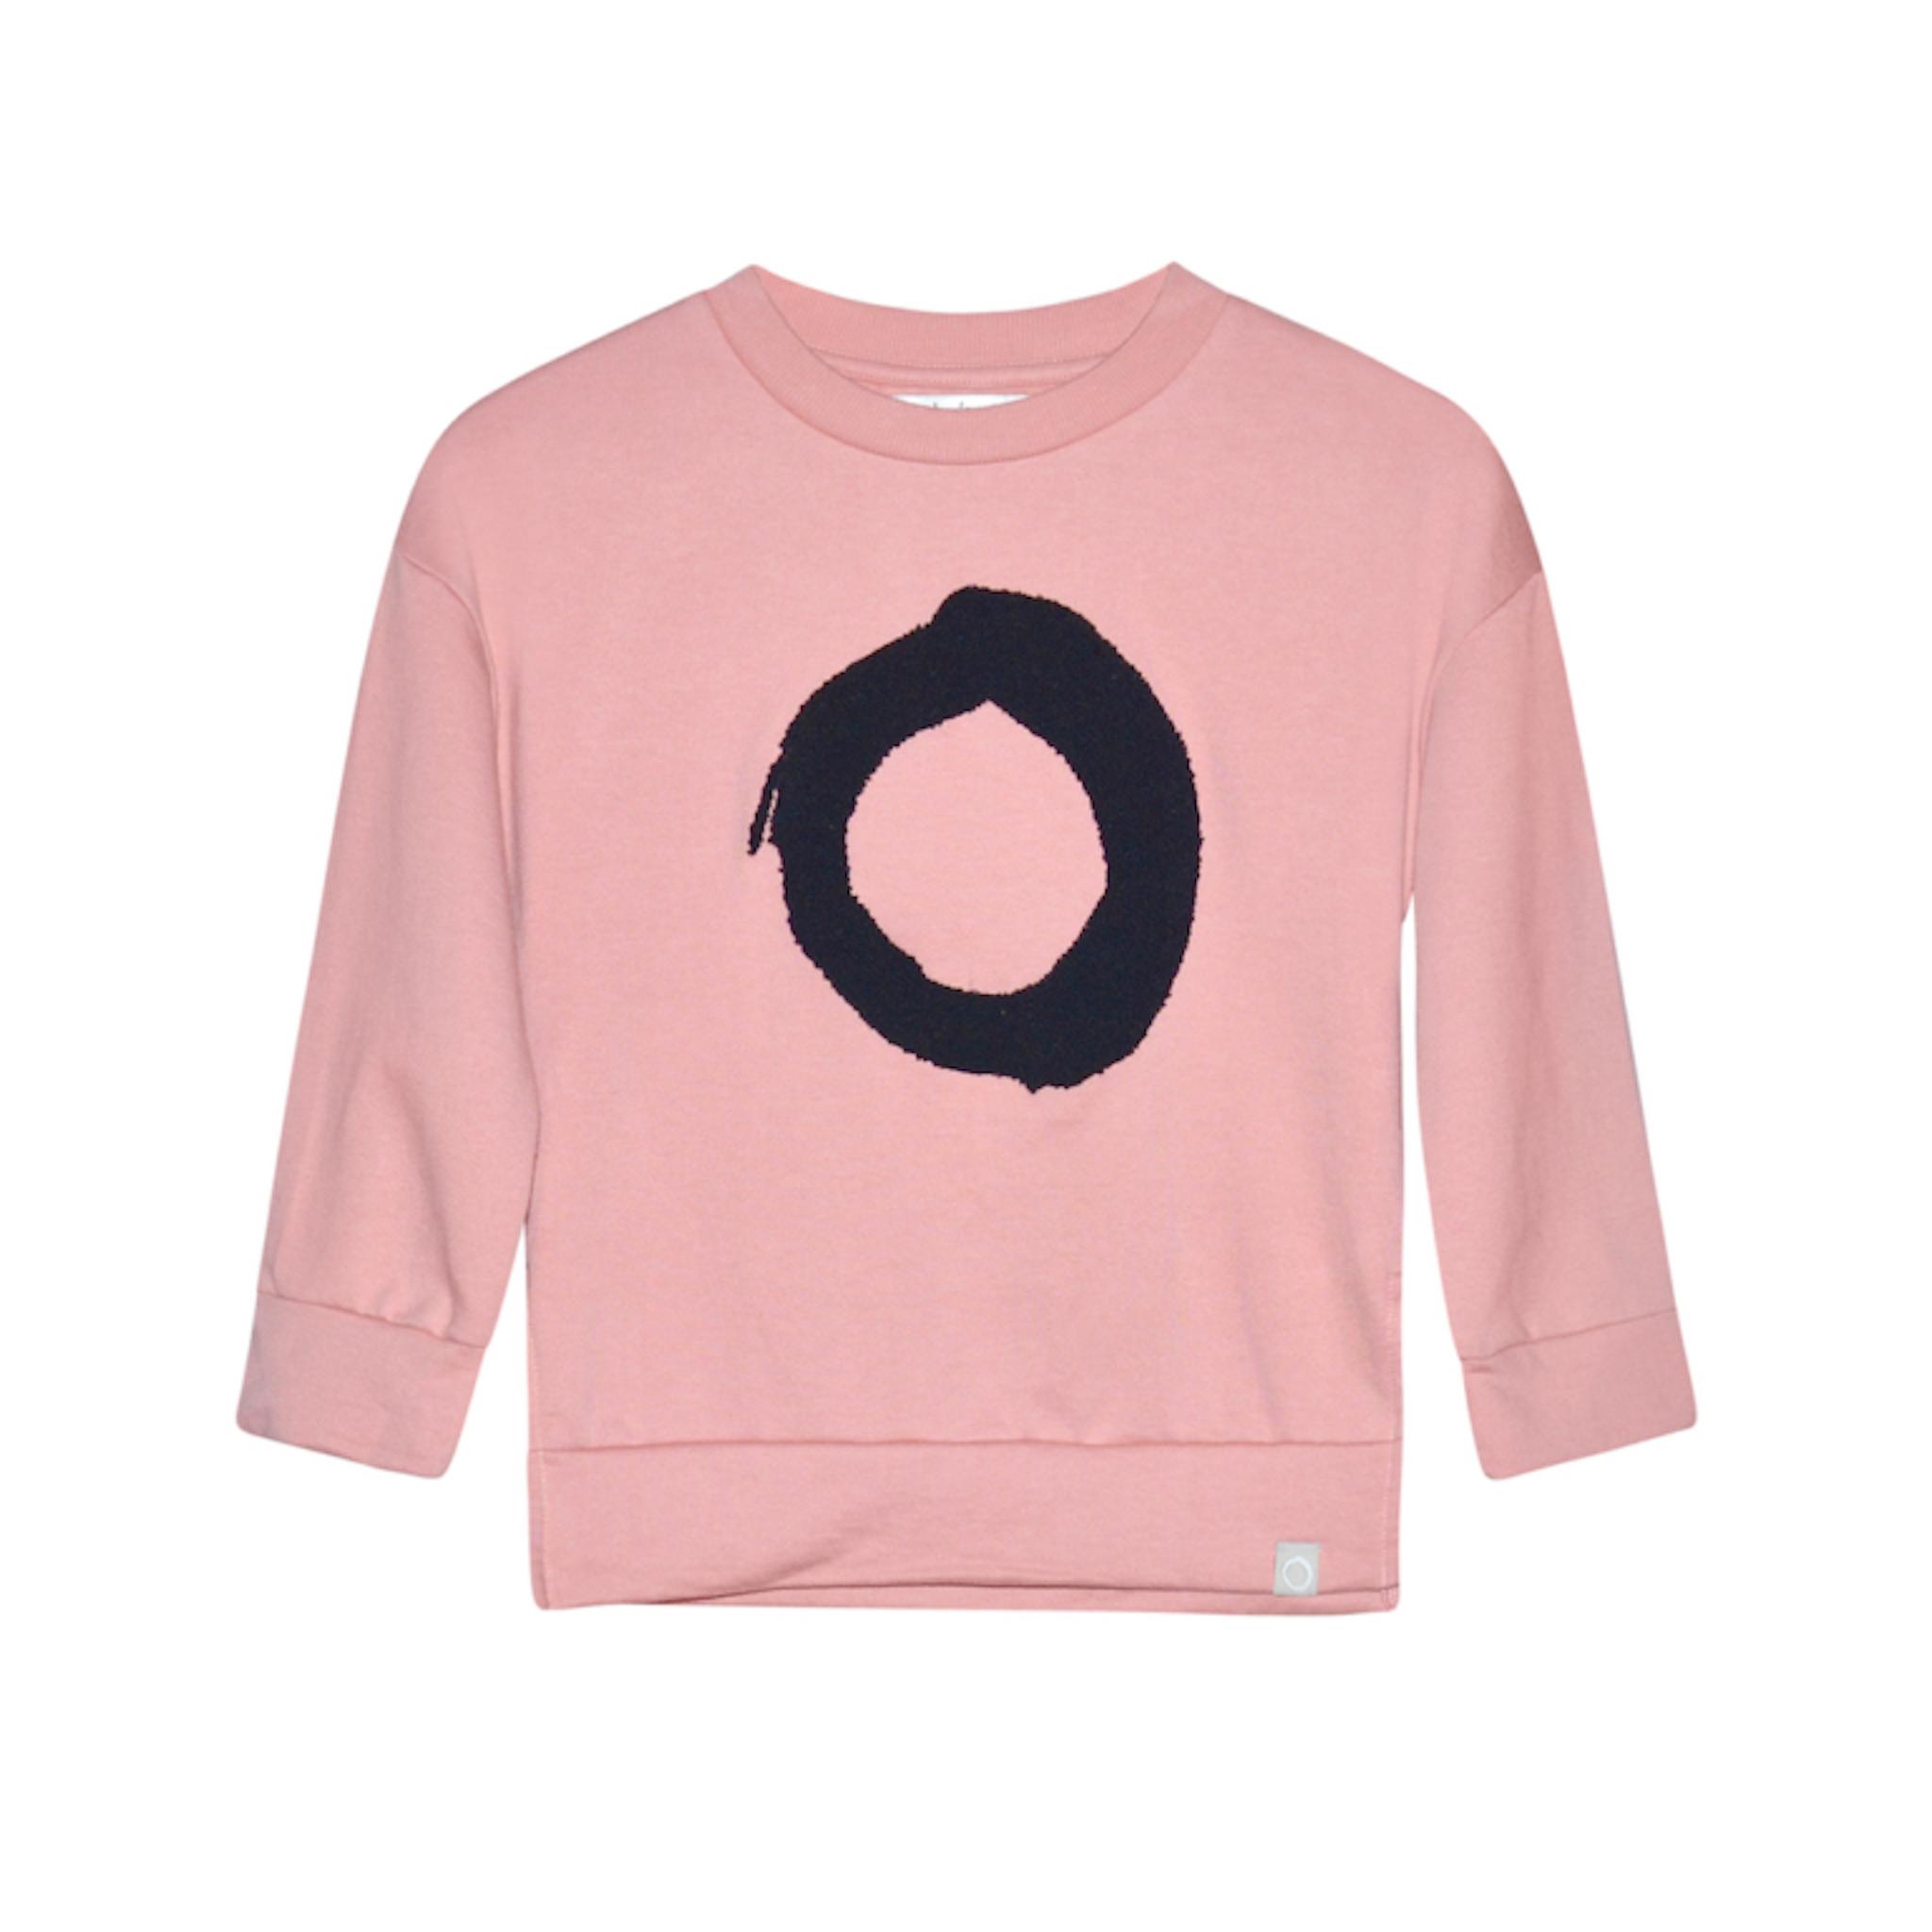 I dig denim - Marlo Sweater Organic - rosé